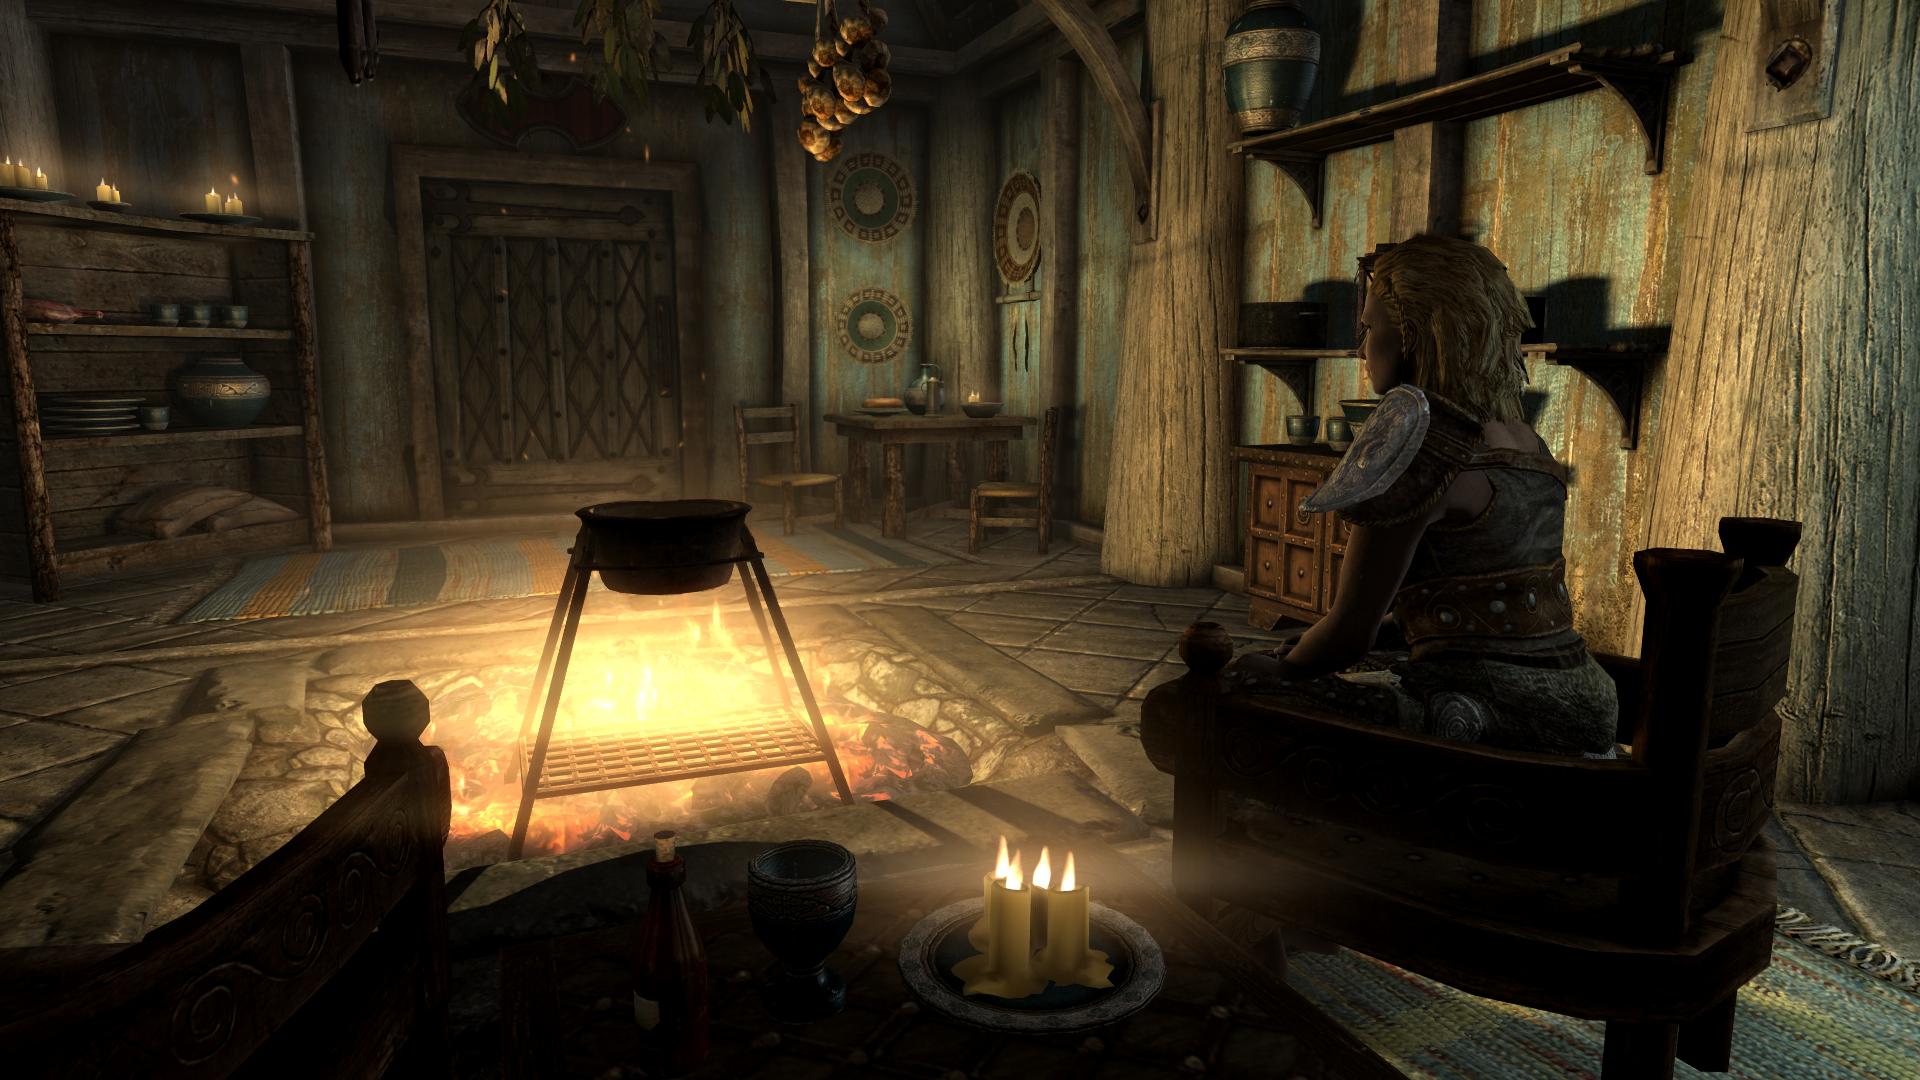 General 1920x1080 The Elder Scrolls V: Skyrim viking RPG screen shot PC gaming